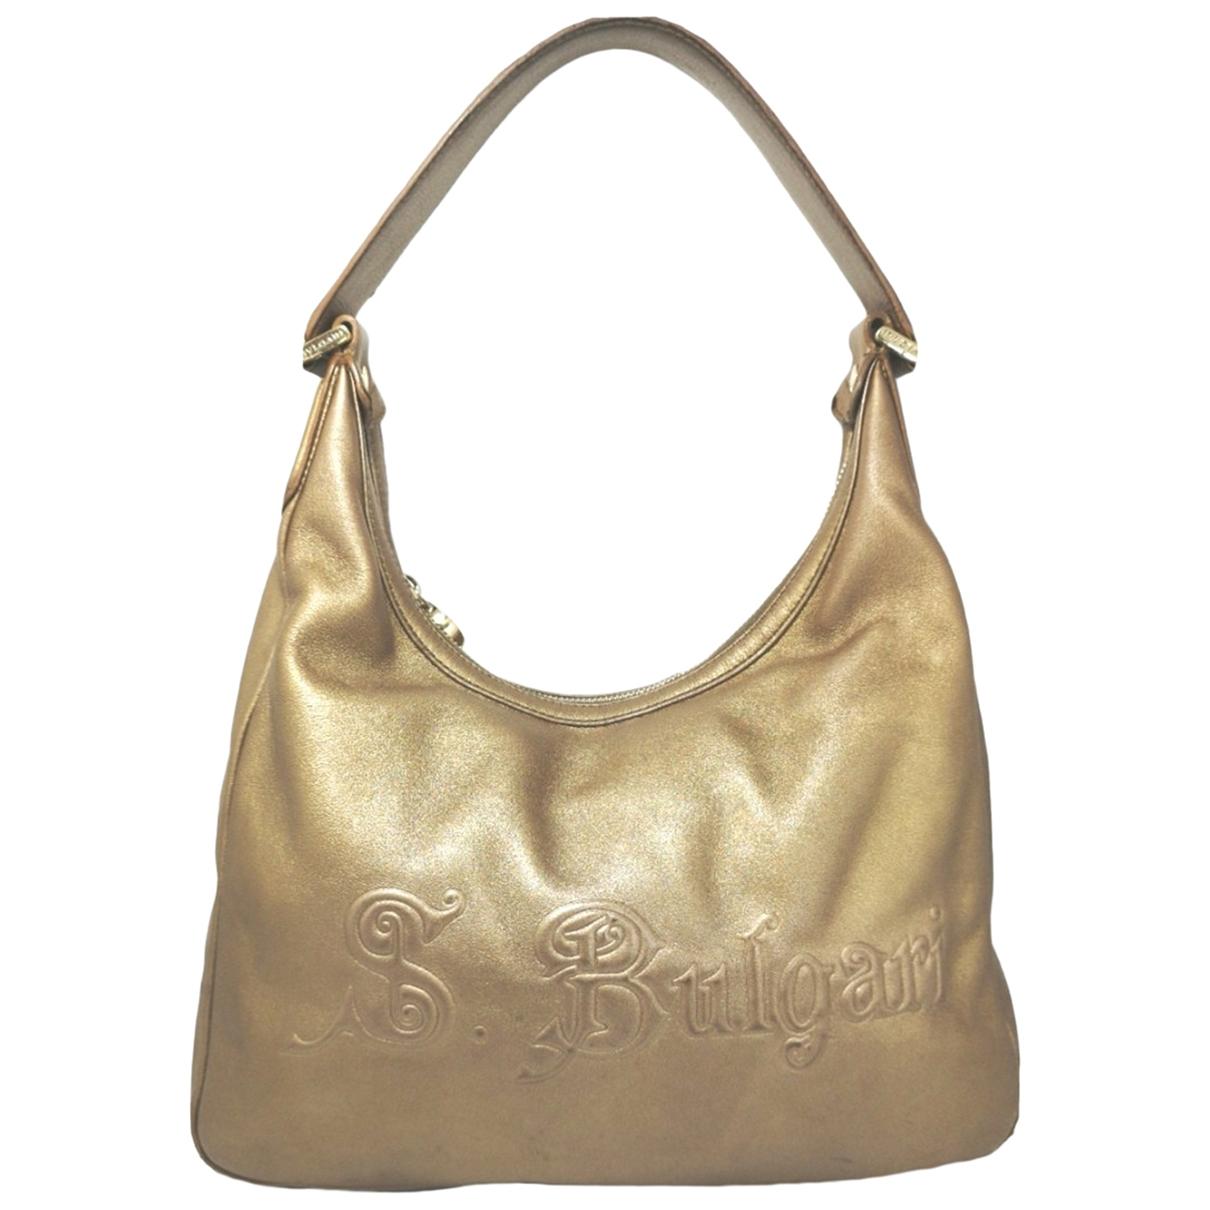 Bvlgari \N Gold Leather handbag for Women \N